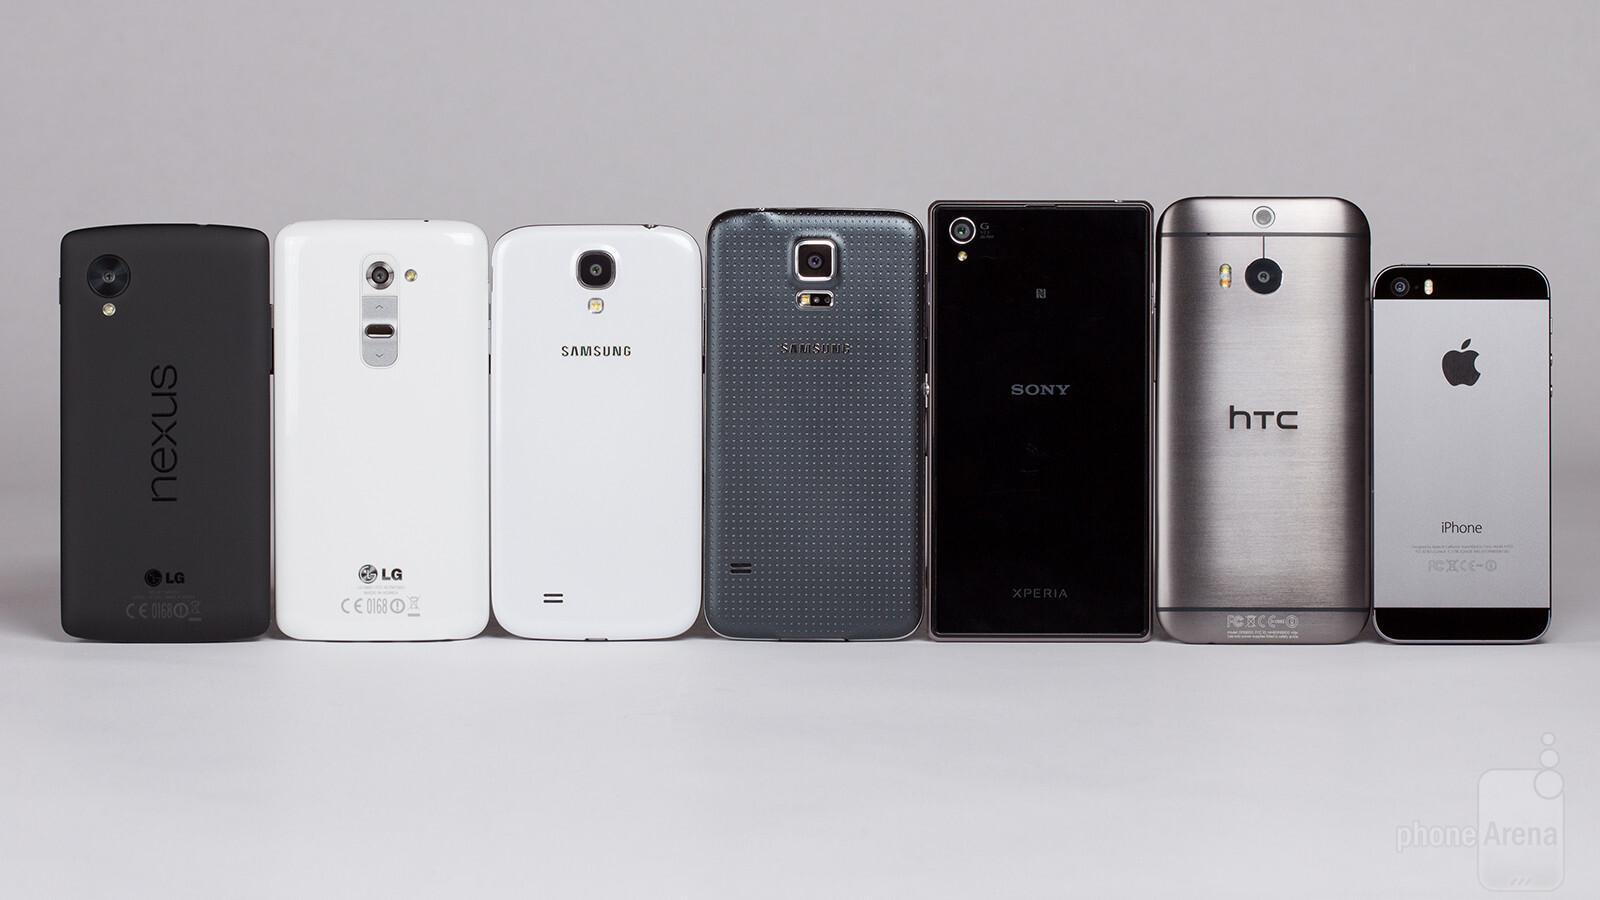 lg g2 vs samsung galaxy s4 vs htc one vs iphone 5